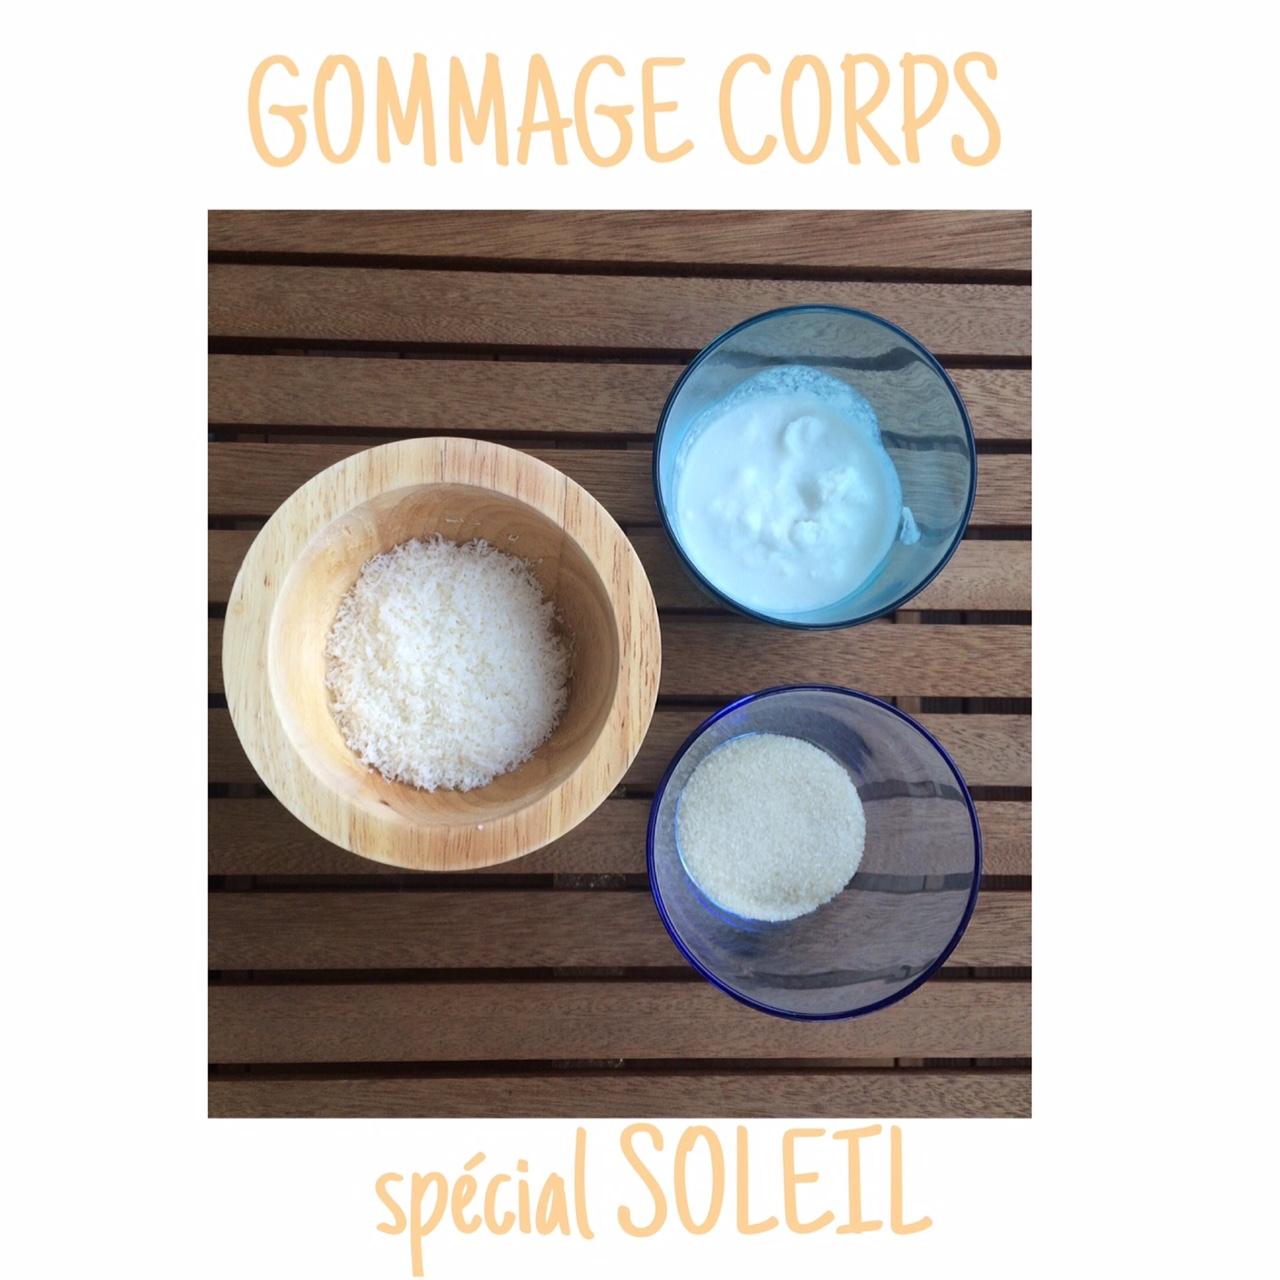 Gommage CORPS – spécial SOLEIL